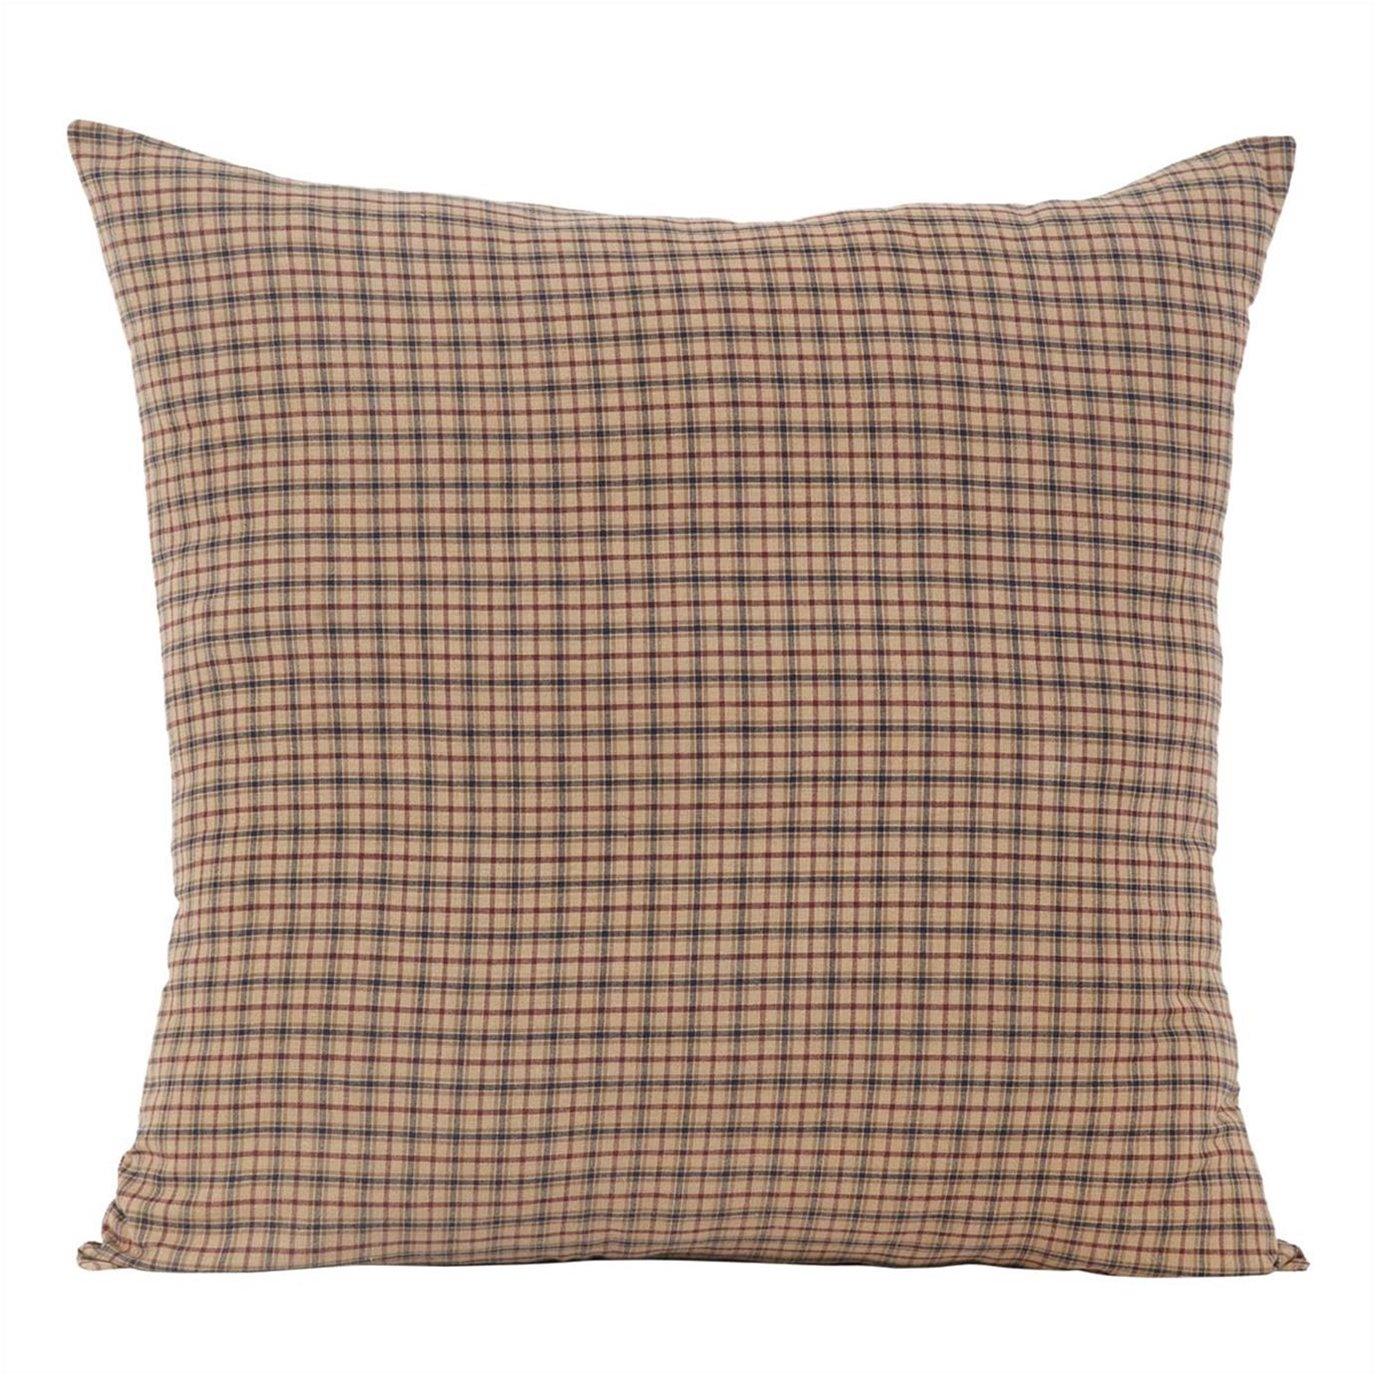 Millsboro Euro Sham Fabric 26x26